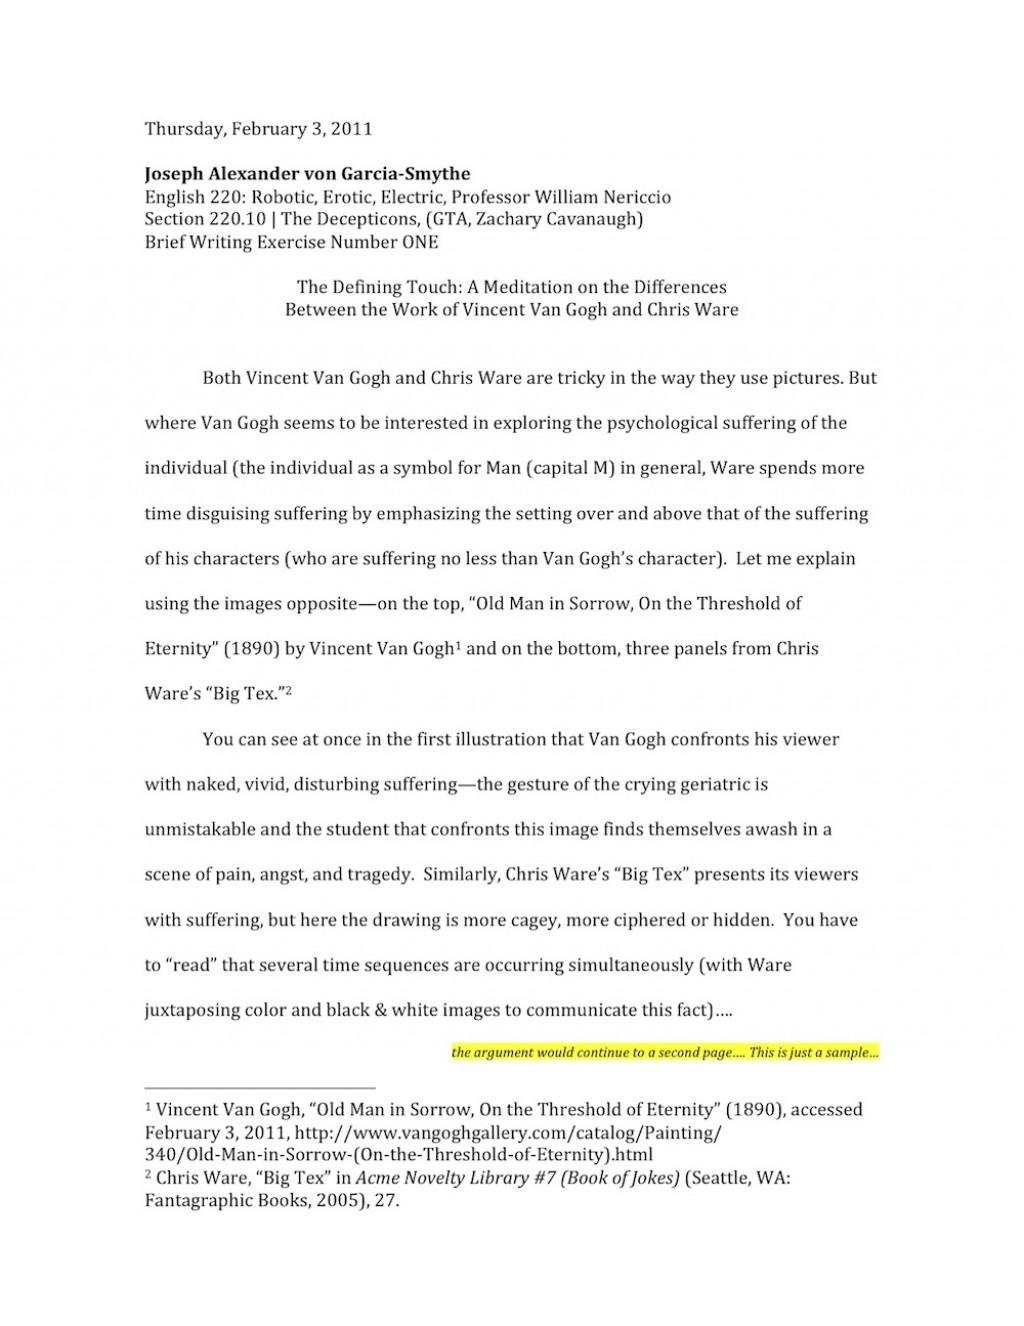 009 Essay Example Nericcio Sampleessay1 Unique Autobiography Pdf Examples For College Large